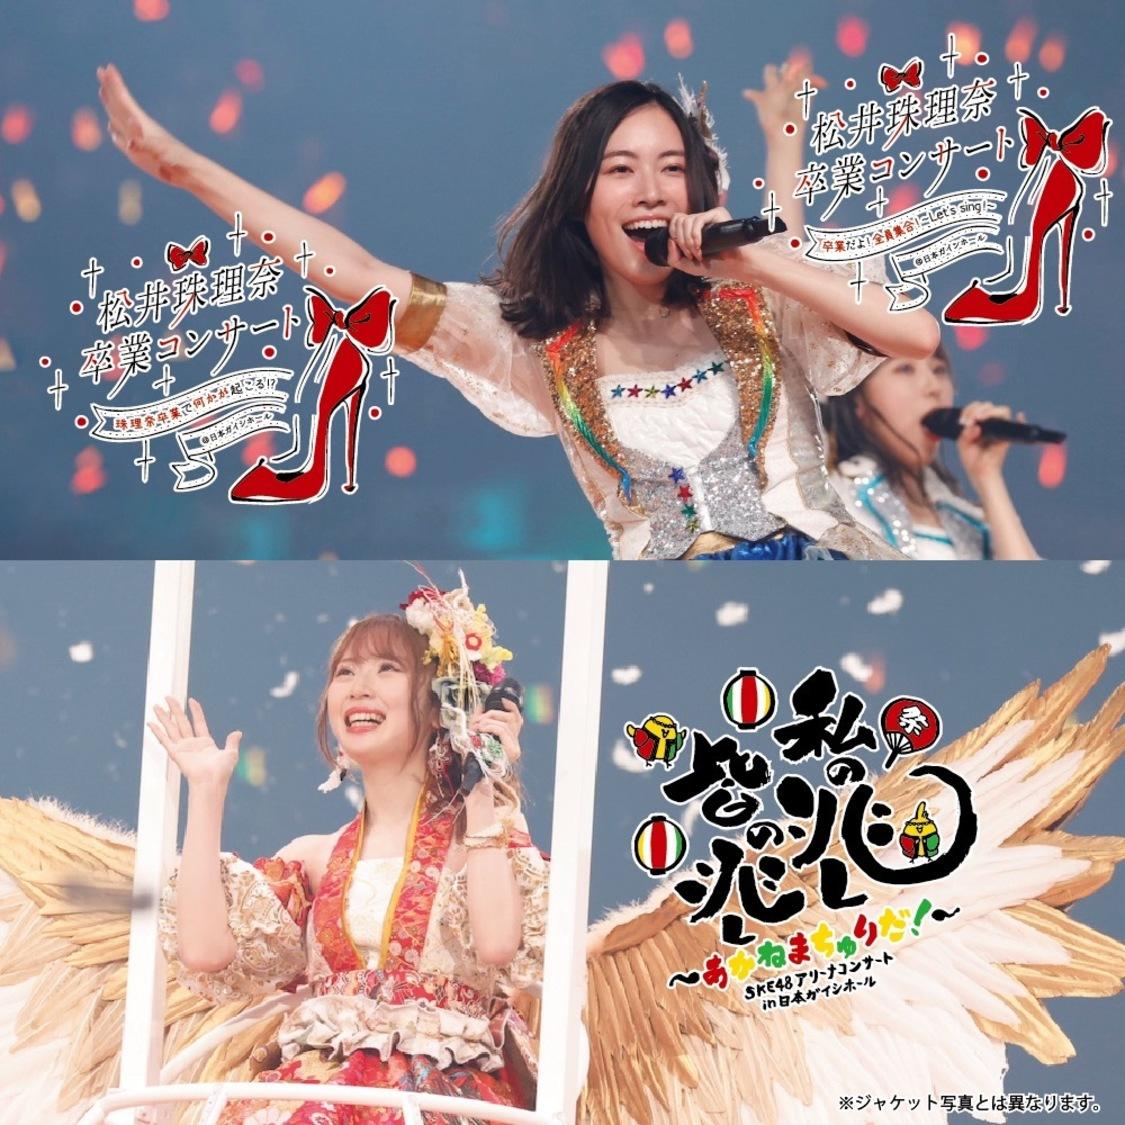 SKE48、松井珠理奈&高柳明音卒業コンサートを収めたスペシャルBD&DVD BOX発売決定!